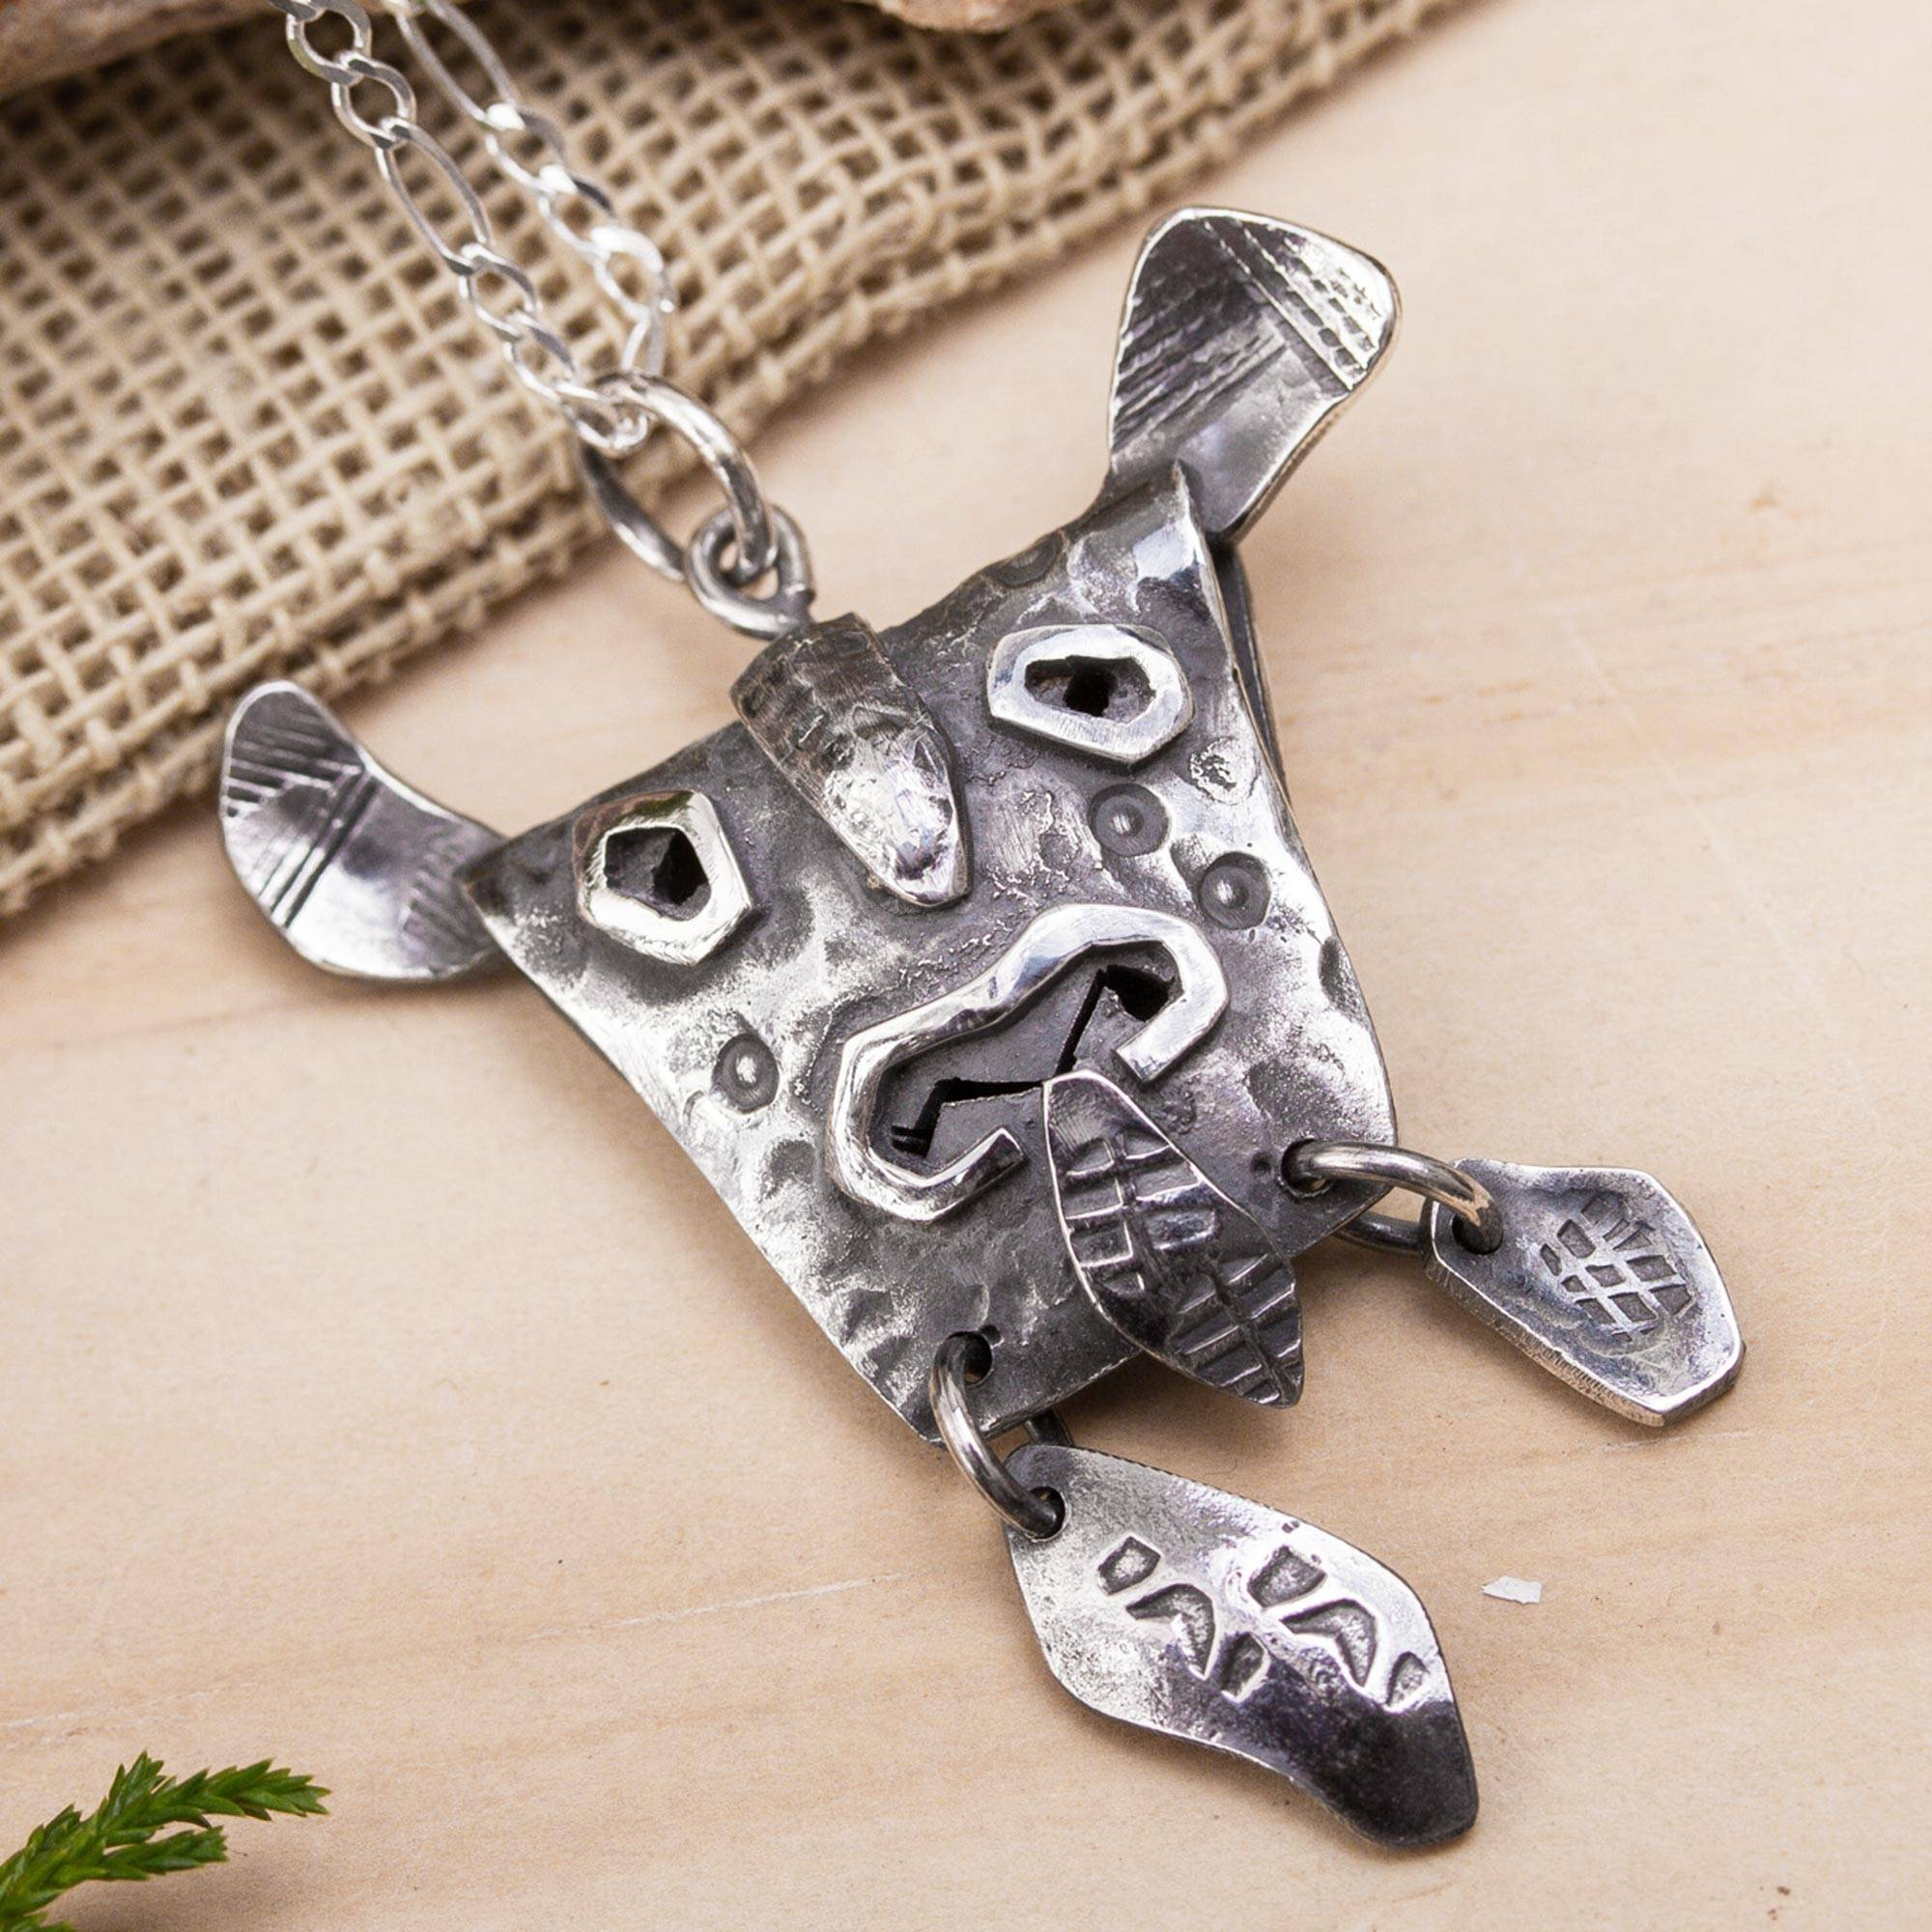 17.75 Hummingbird in Love NOVICA .925 Sterling Silver Pendant Necklace